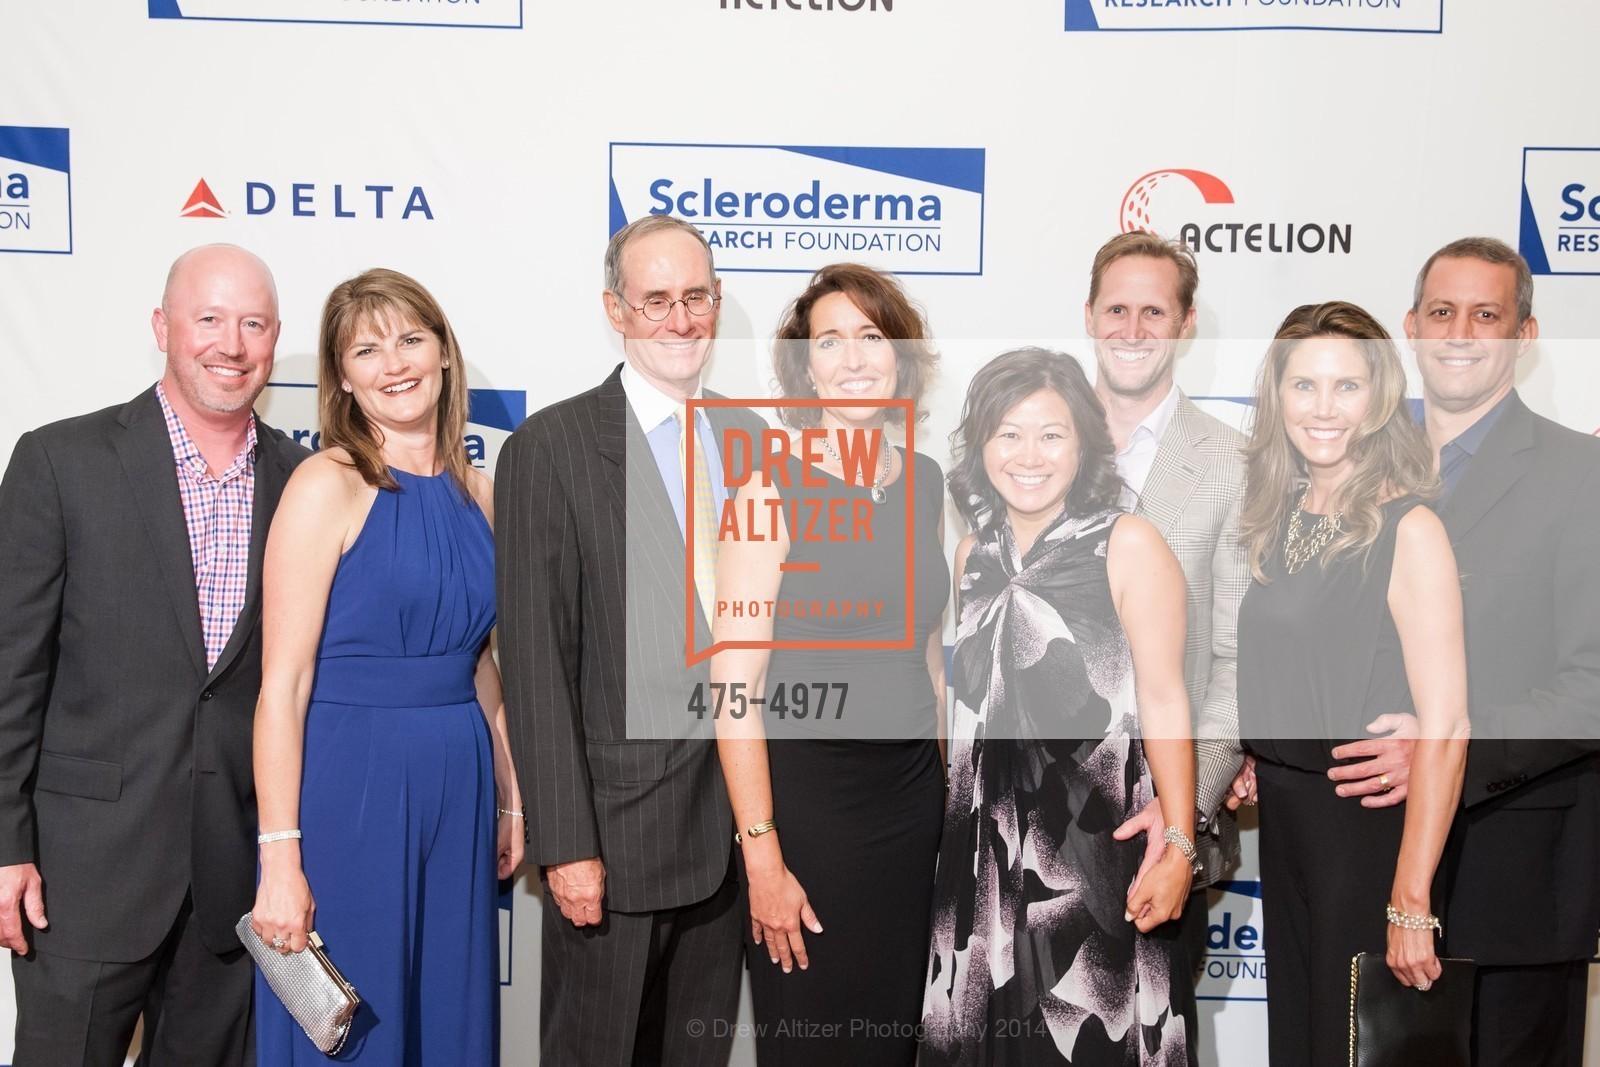 Stacy Charlesworth, Chris Charlesworth, Russ McCambless, Lynn McCambless, Yosh Neugebauer, Laurie Fischler, Photo #475-4977